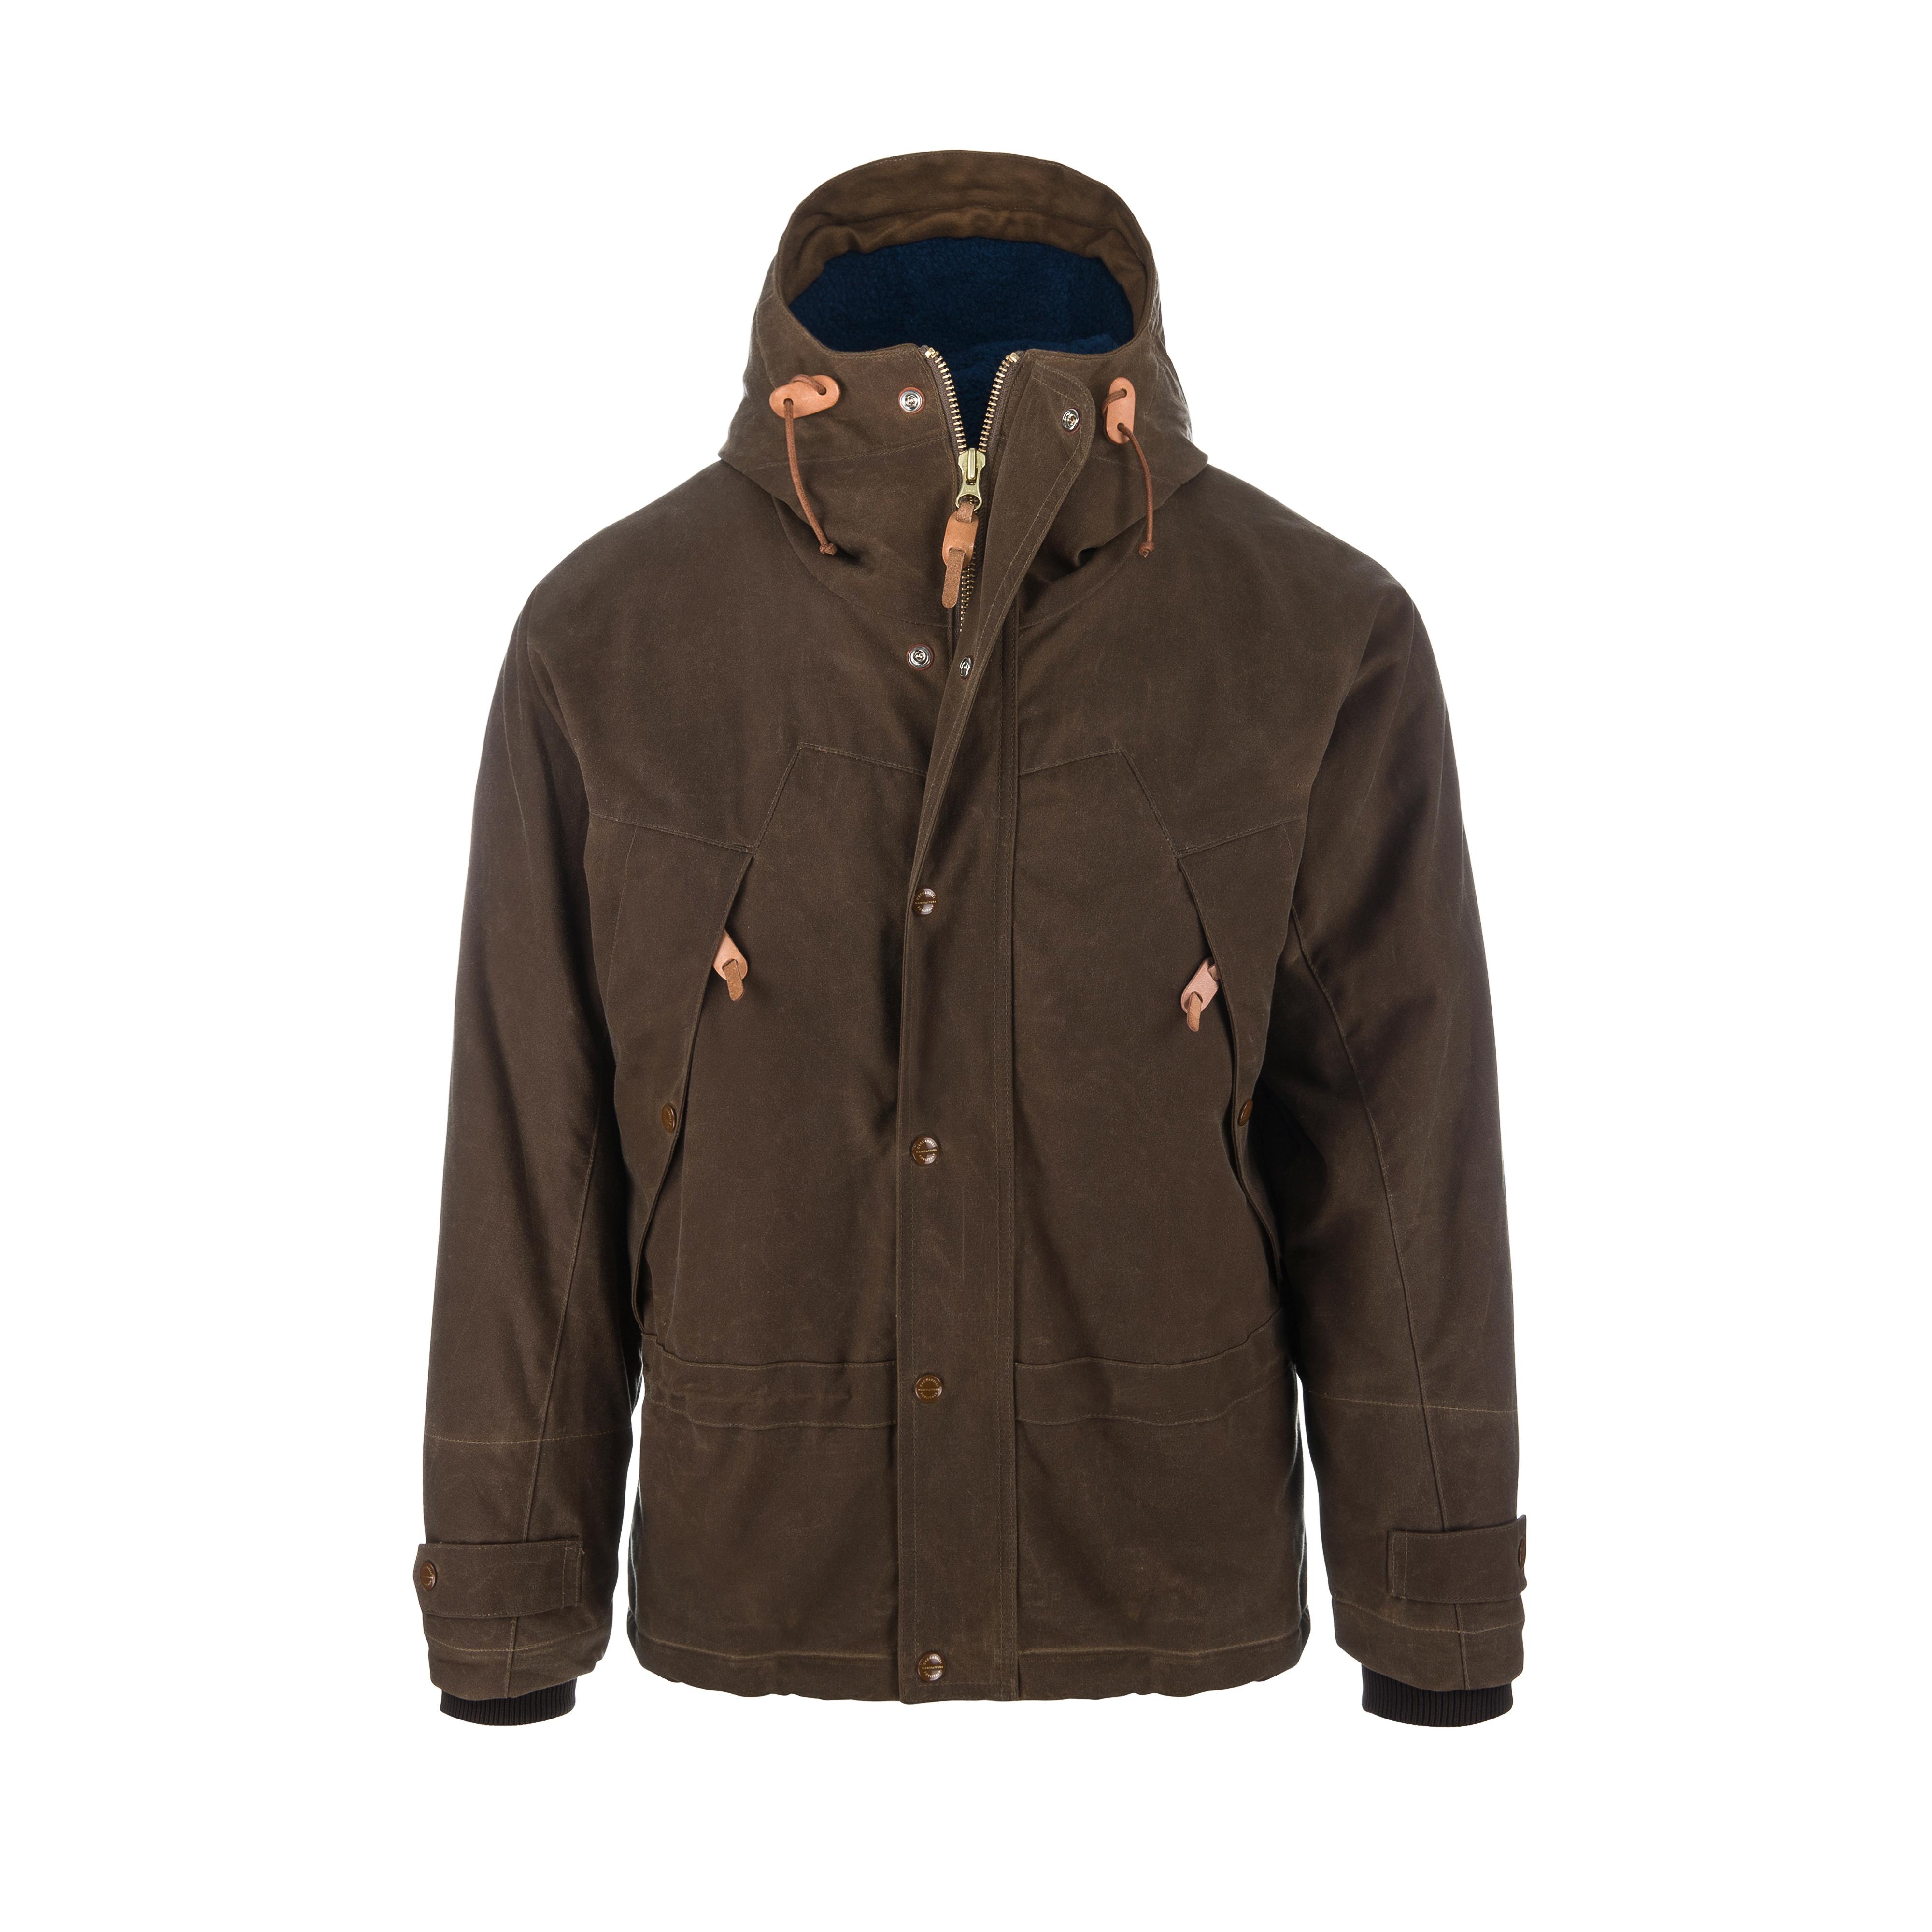 Mountain Jacket Dark Tan